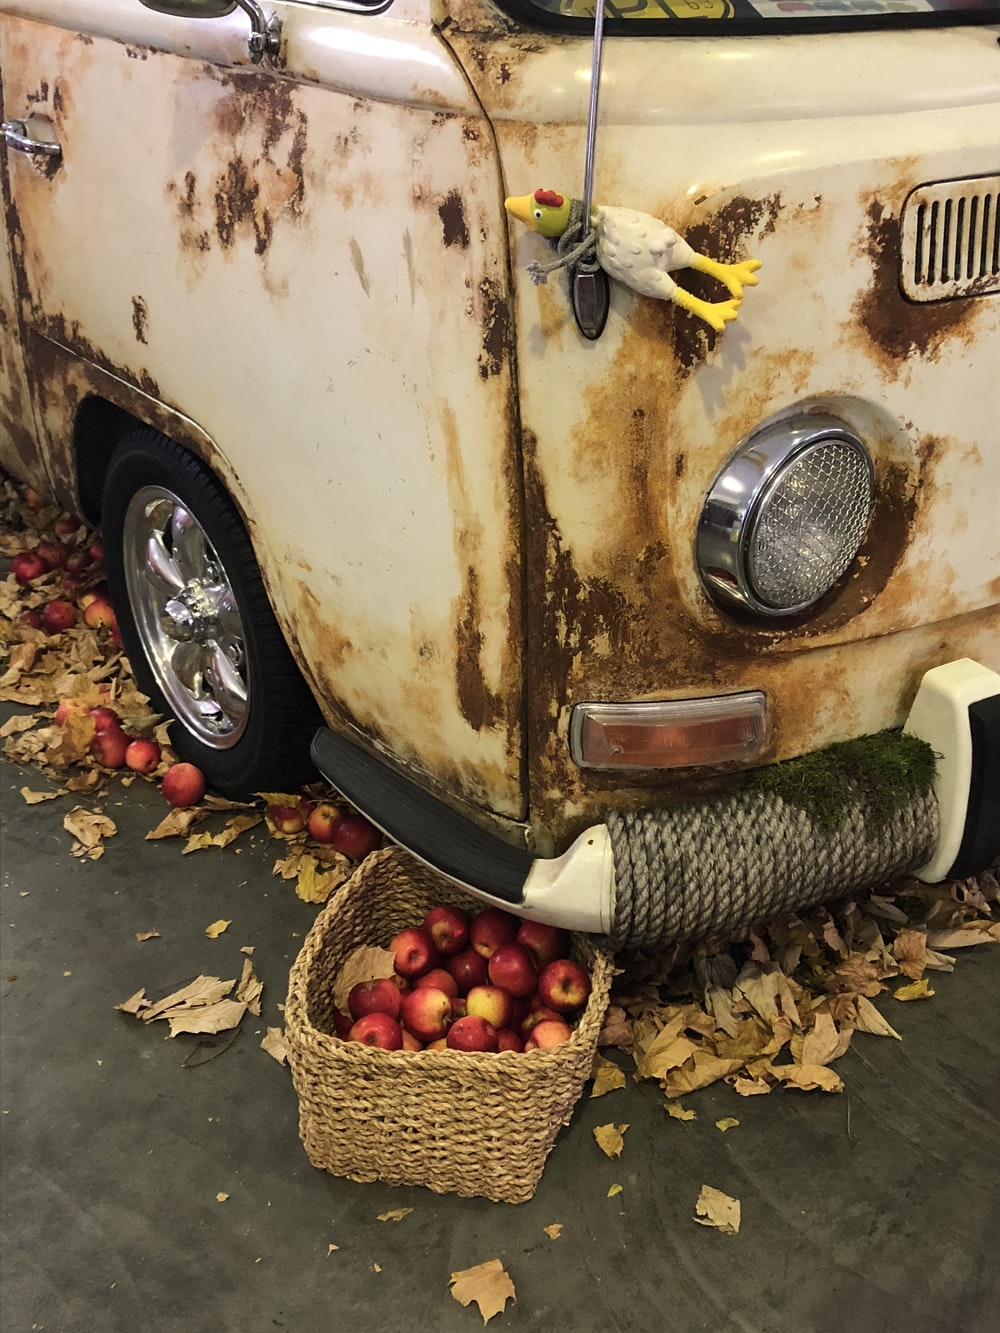 apples in brown woven basket under white van